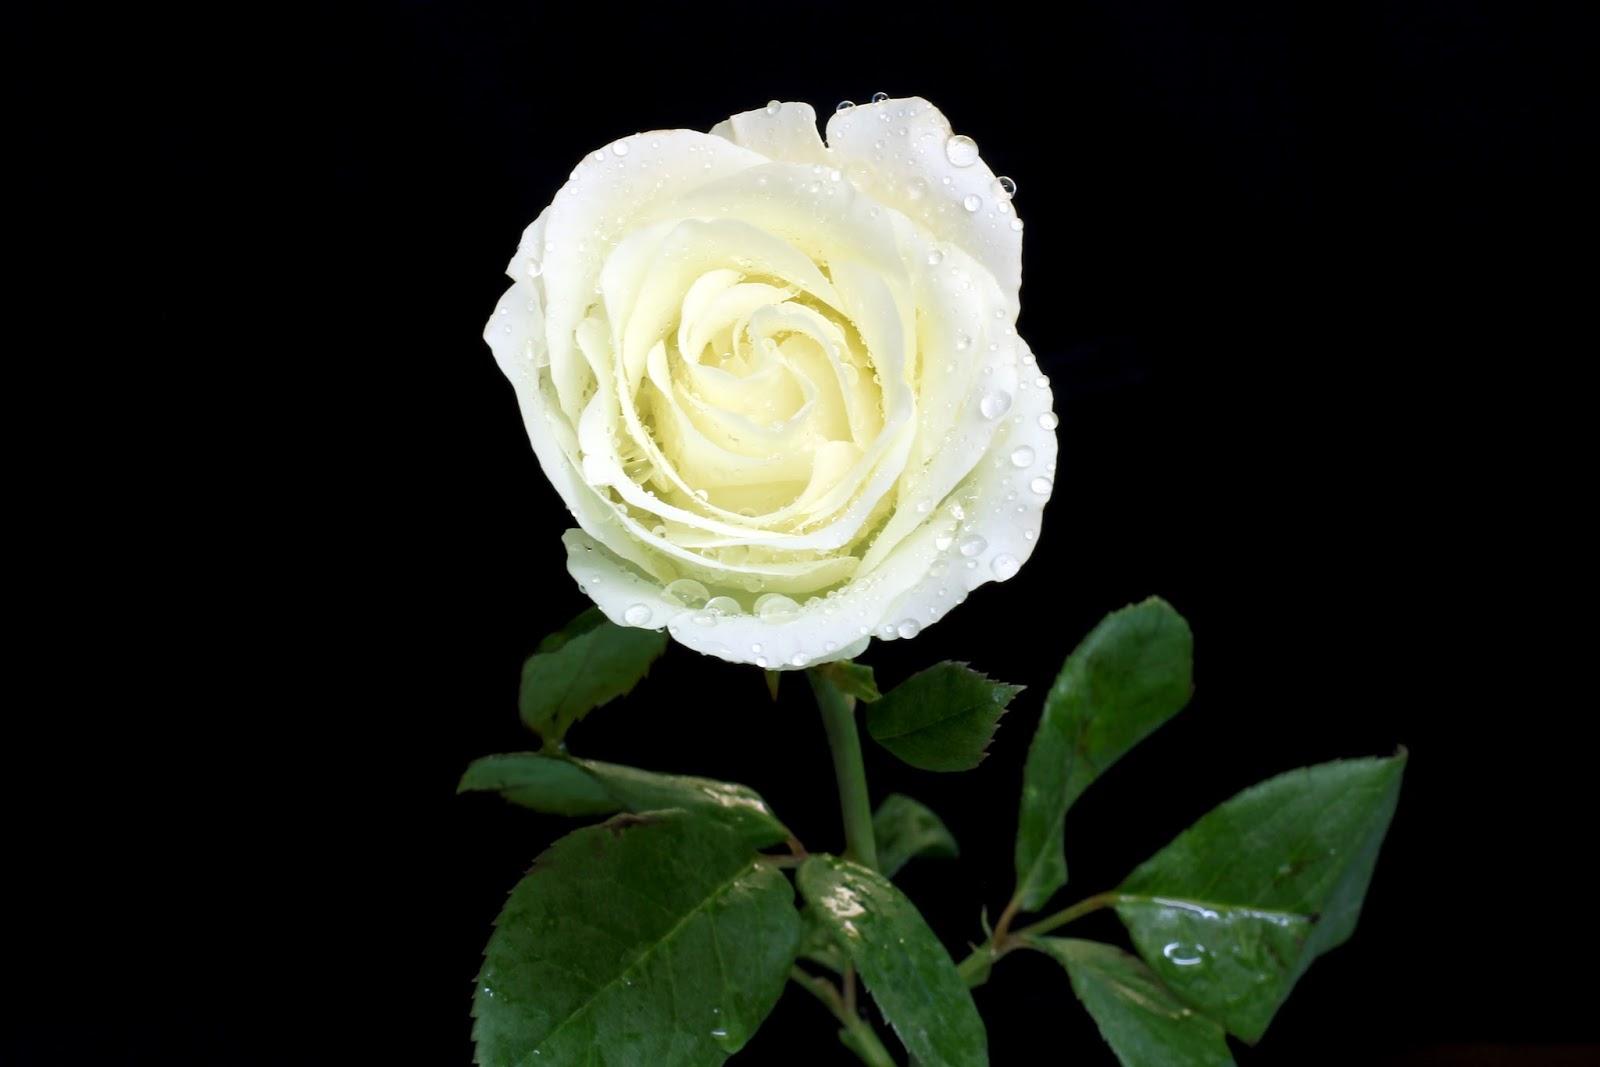 Imagenes De Rosas Blancas Hermosas - Las Flores mas hermosas del mundo Taringa!